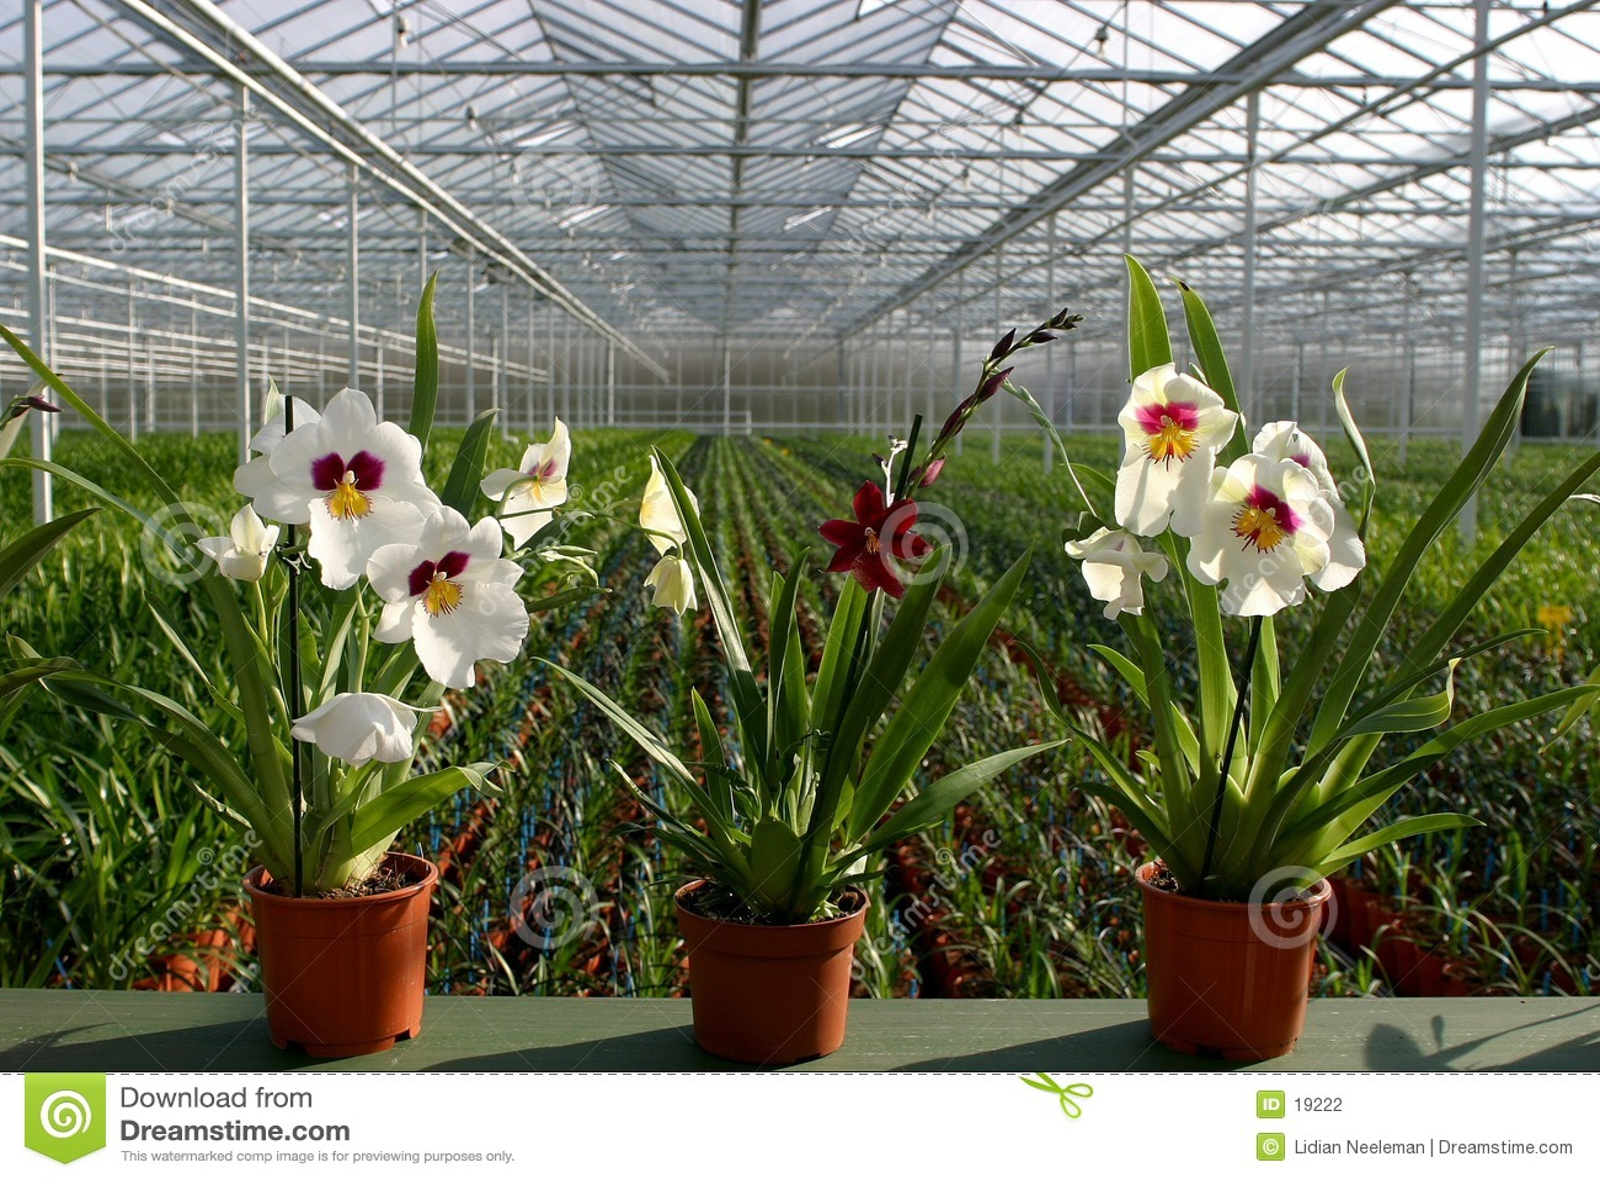 Installatie kinderdagverblijf-Orchideeën